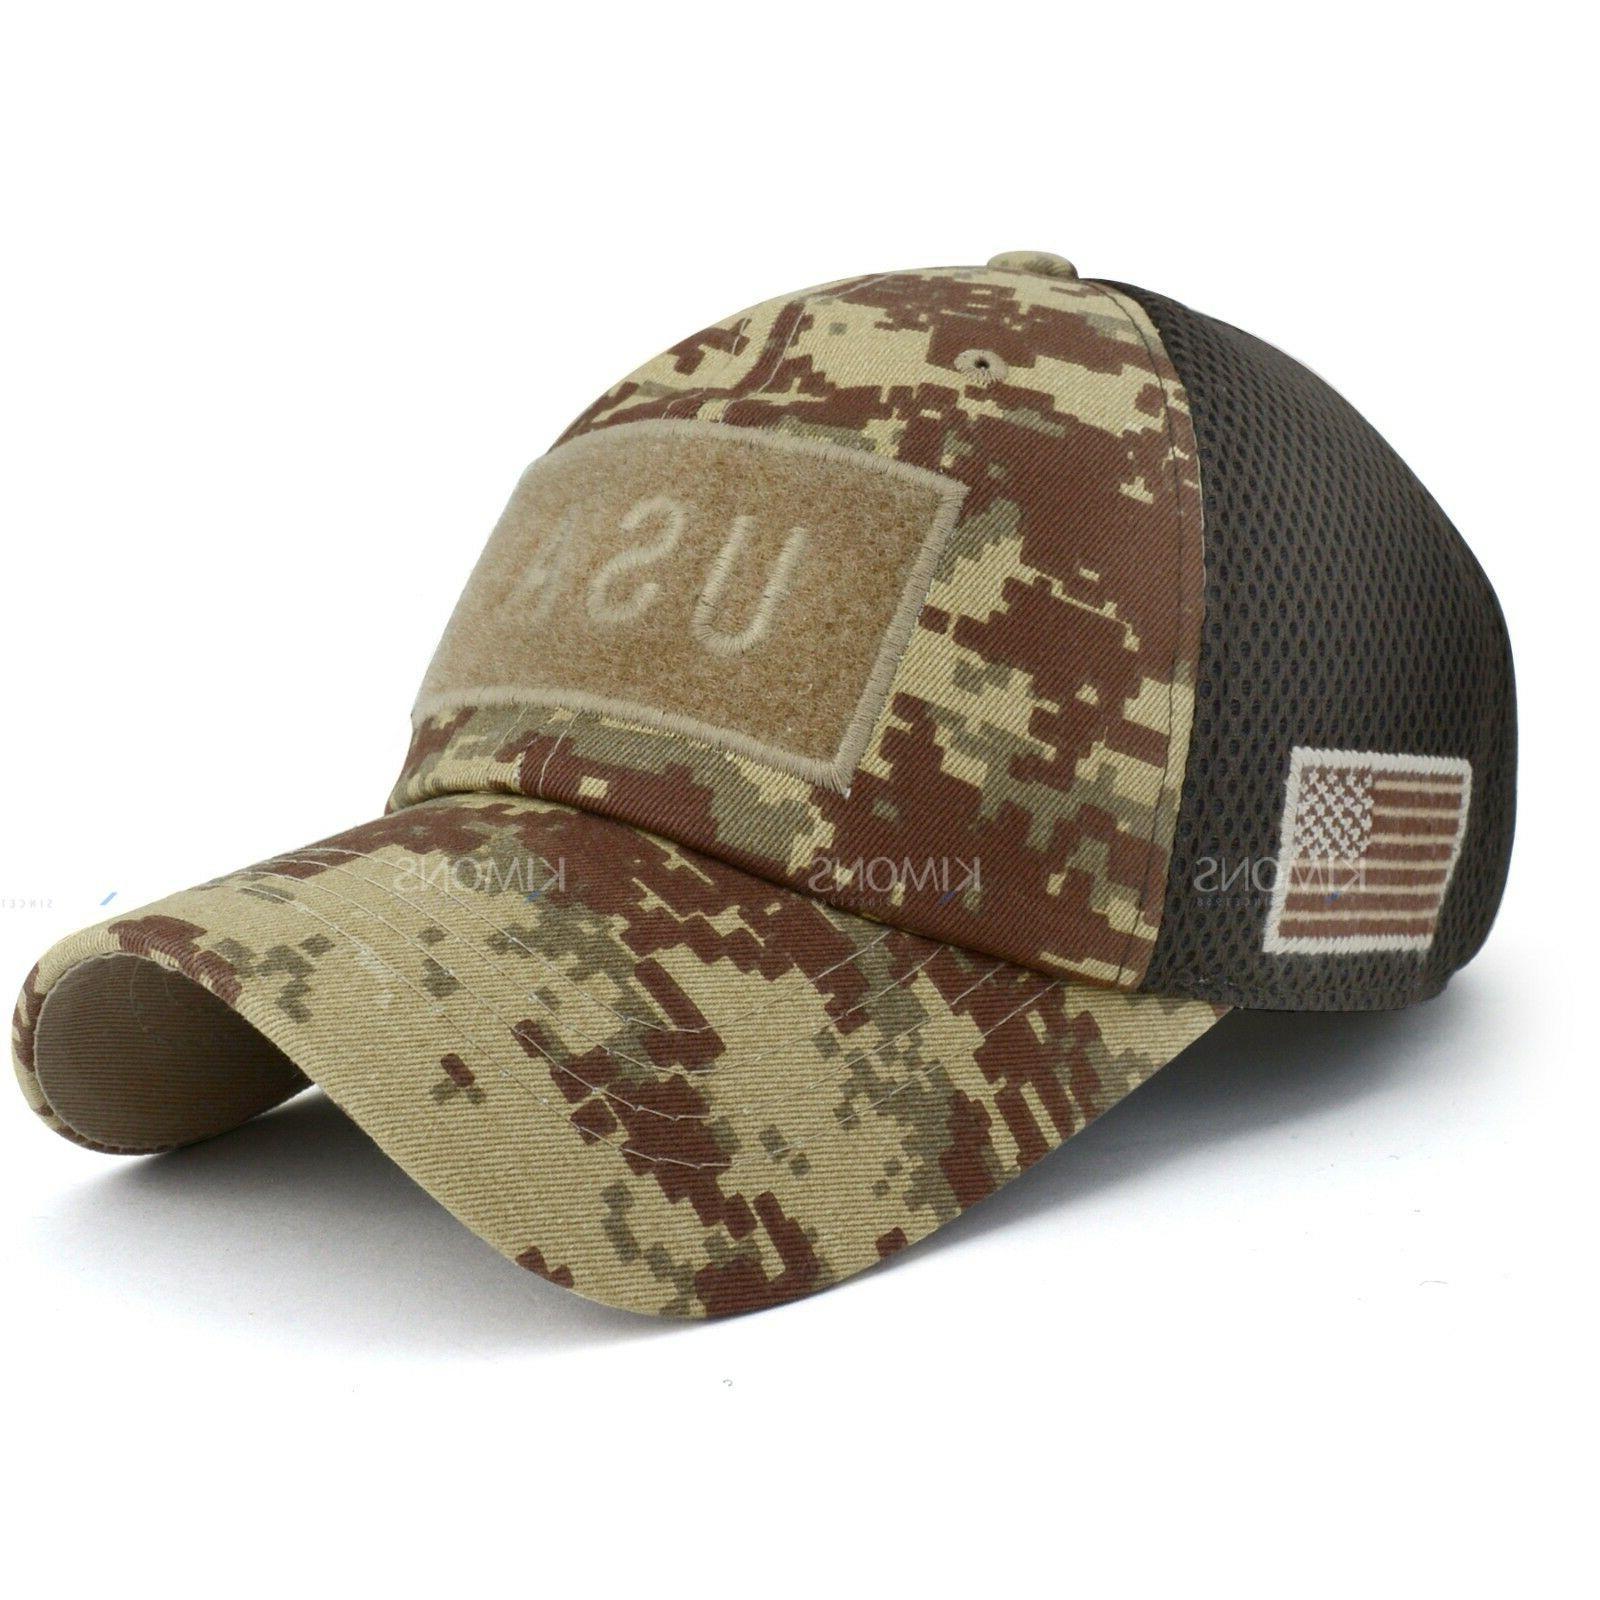 USA American Flag Detachable Military cap Cotton